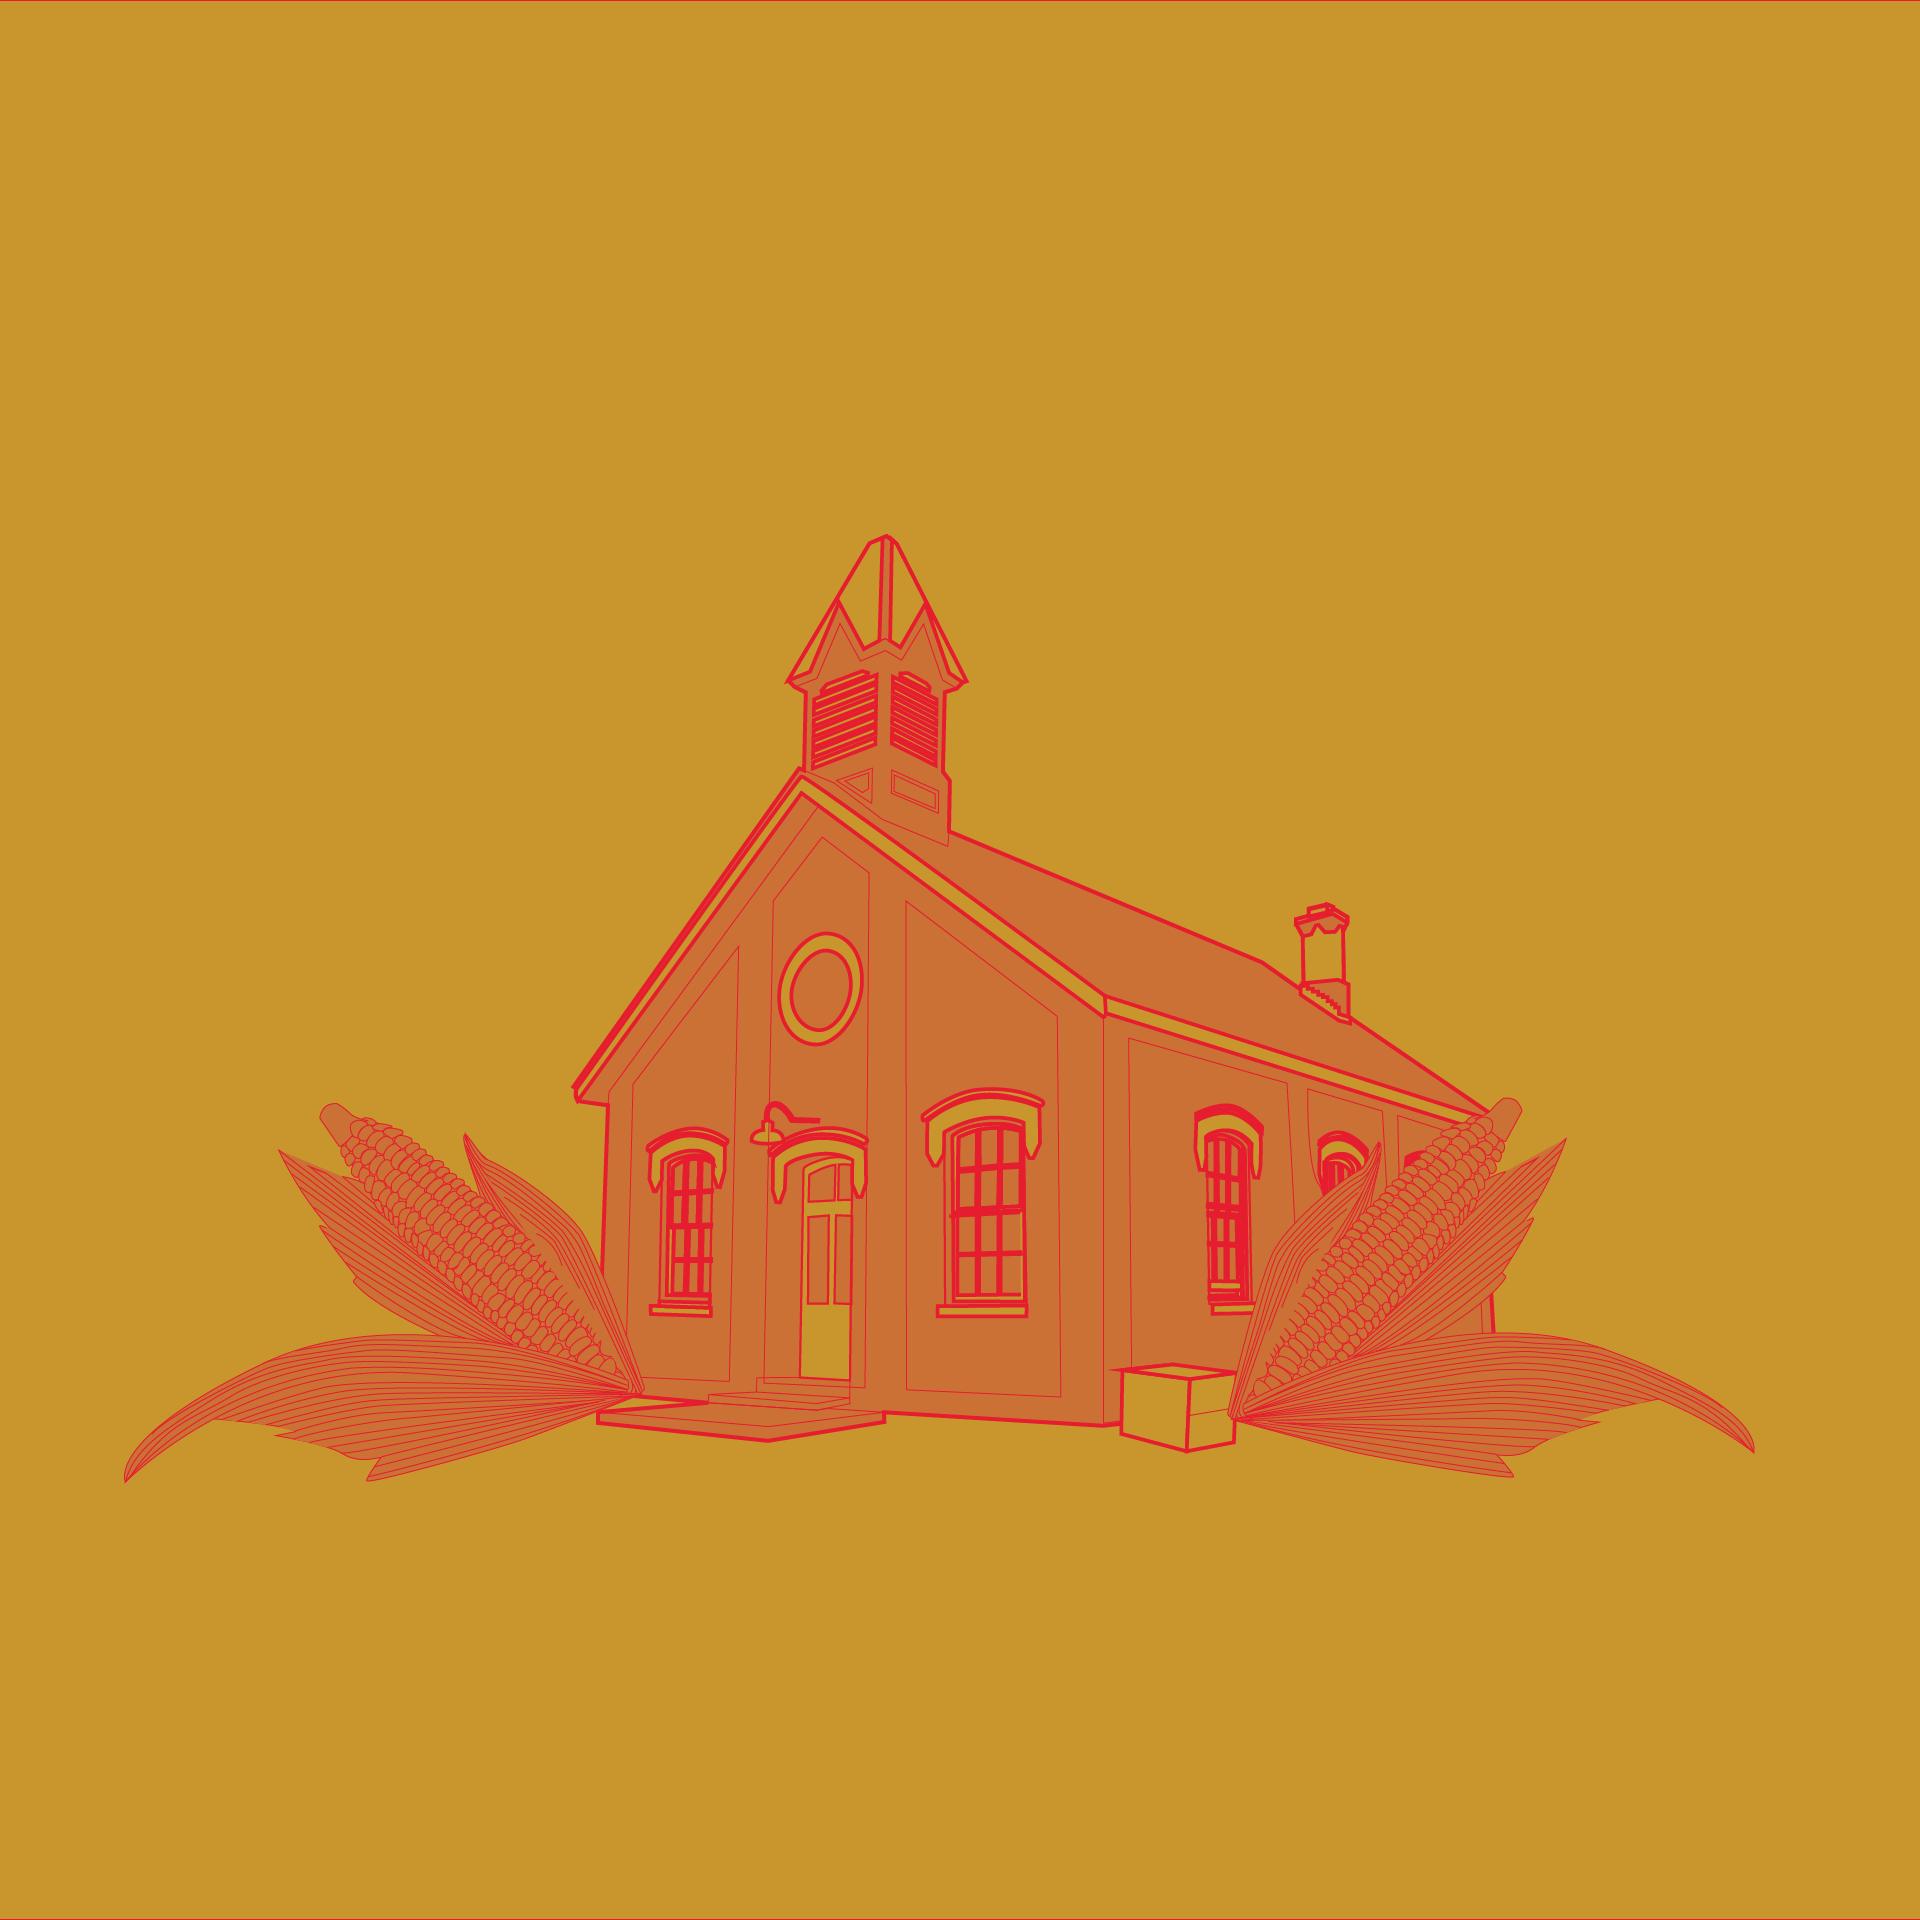 bt_schoolhouse